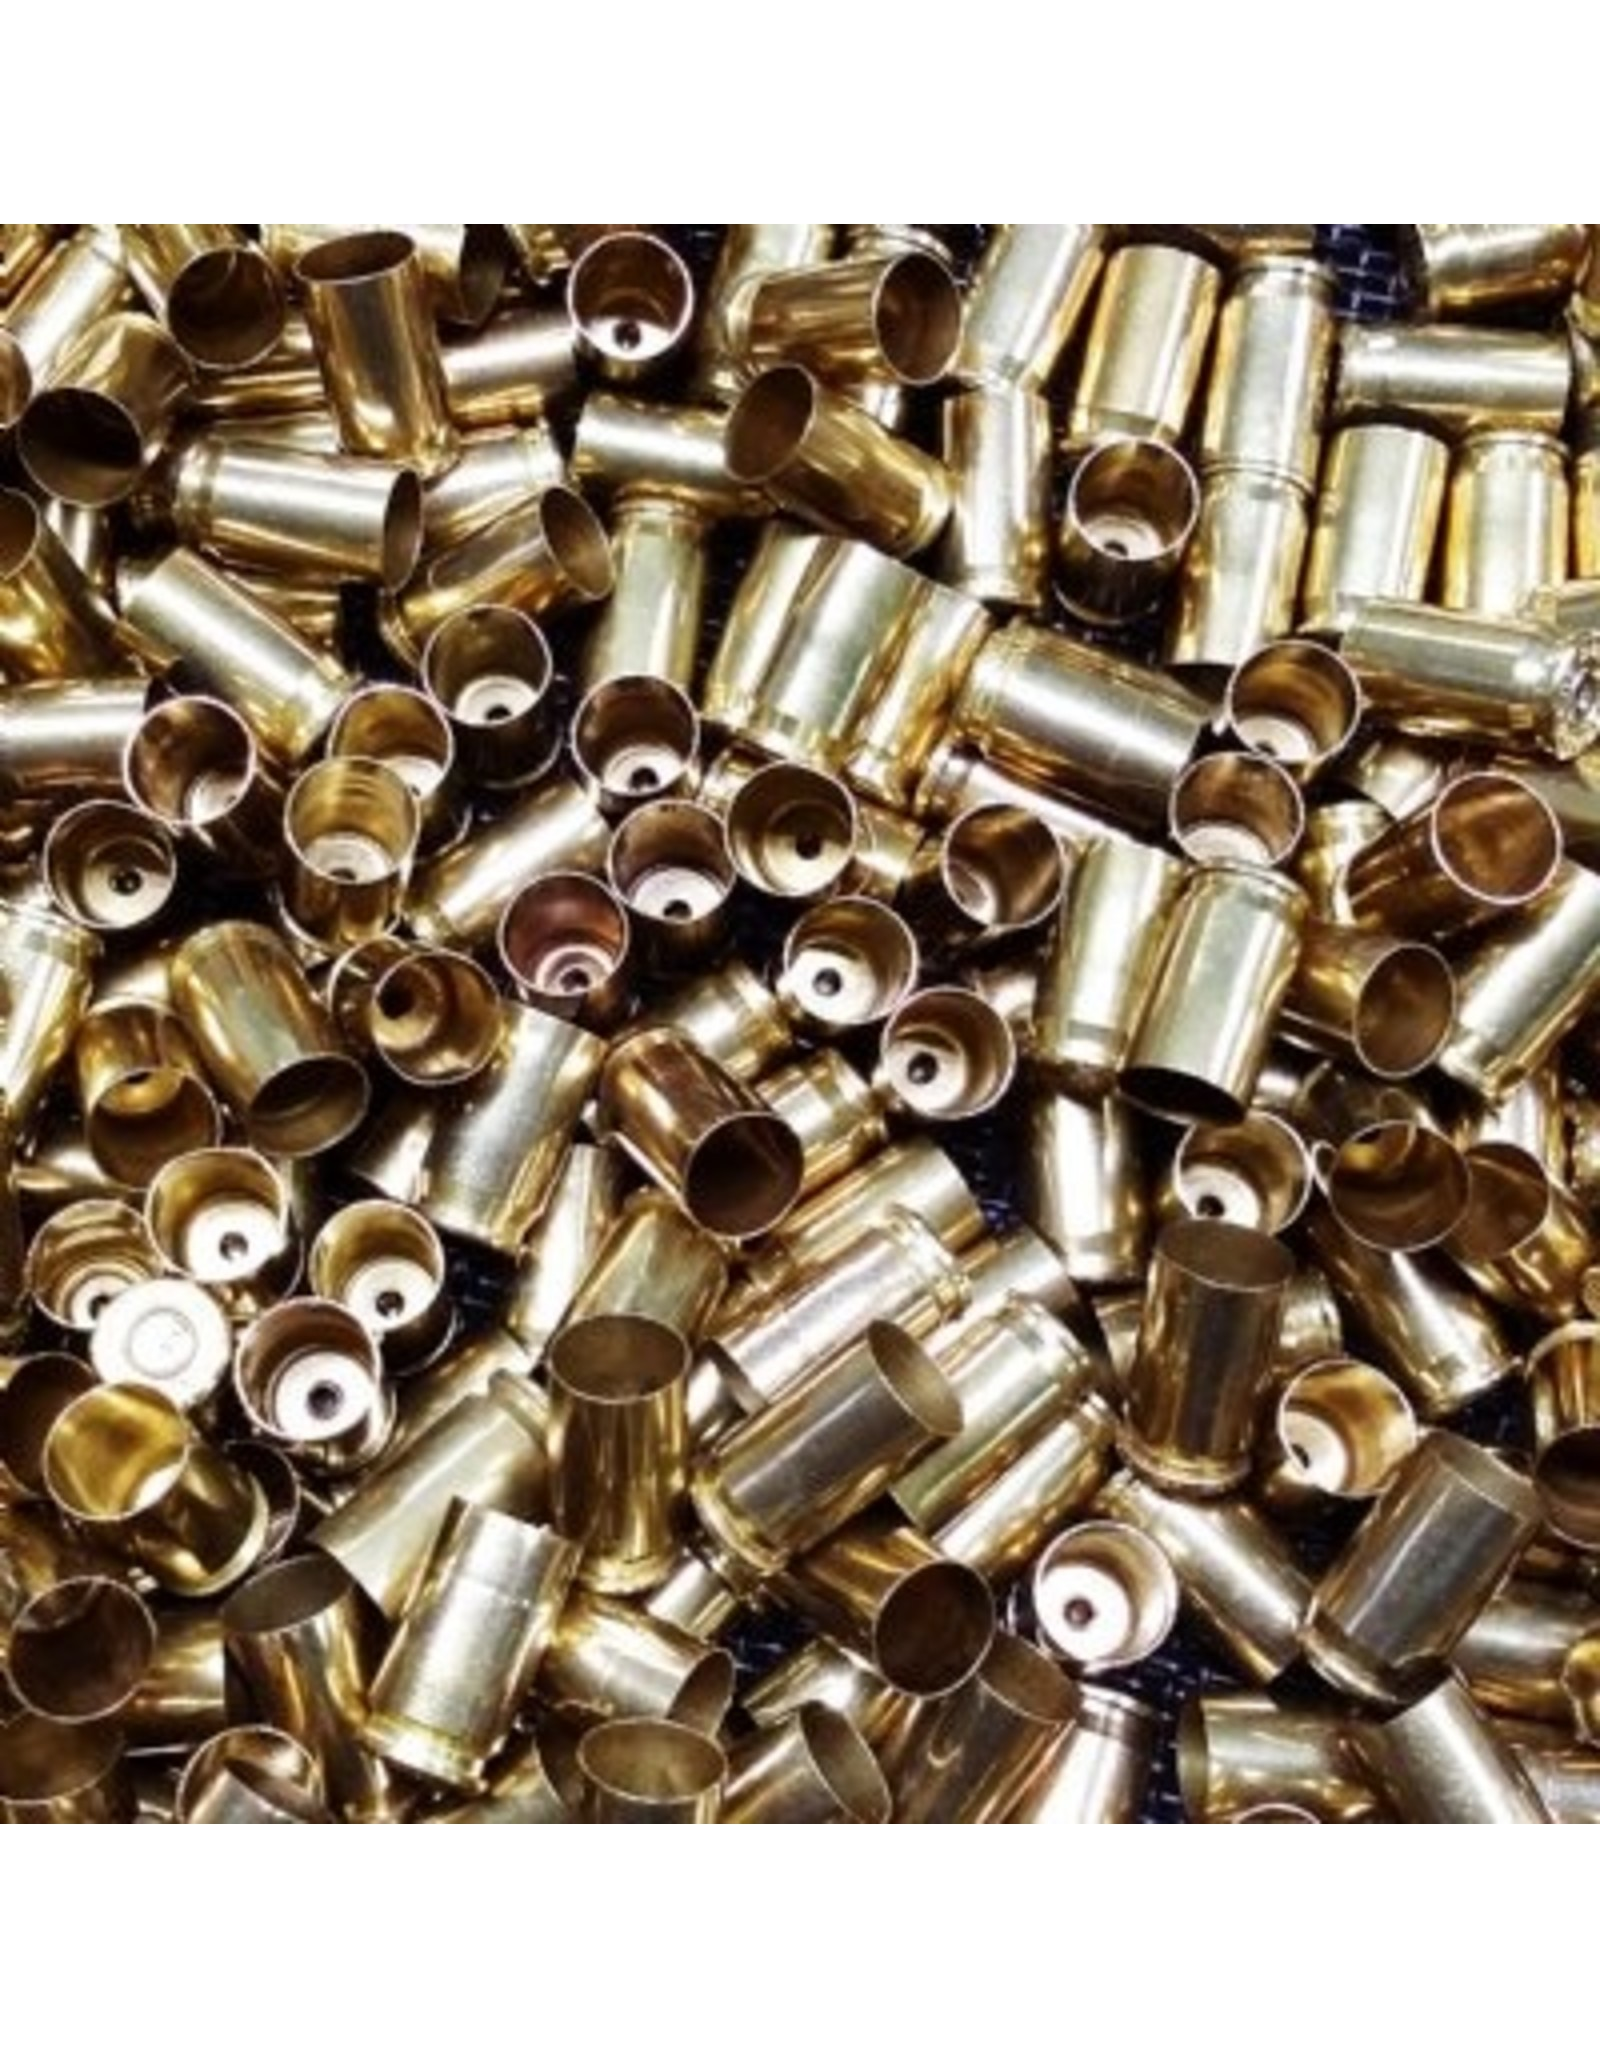 .45 Long Colt Brass - 76 Count